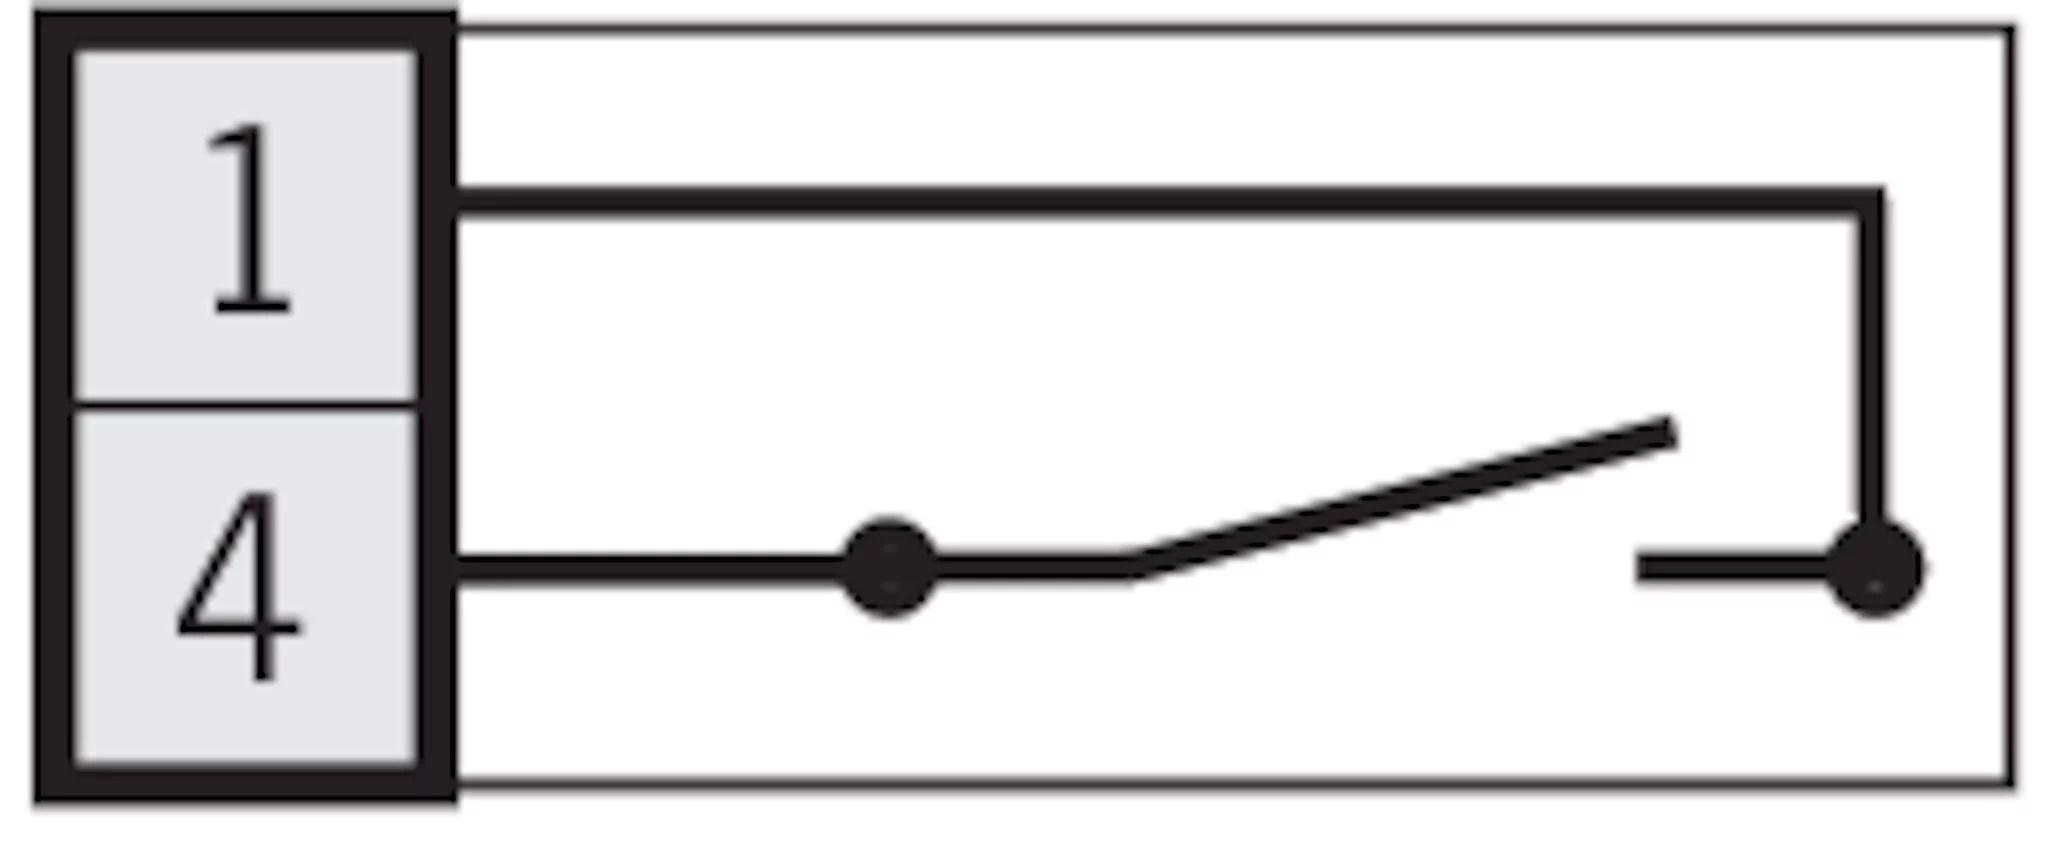 Egt1 4asem4c Precision Single Hole Fixing Limit Switch